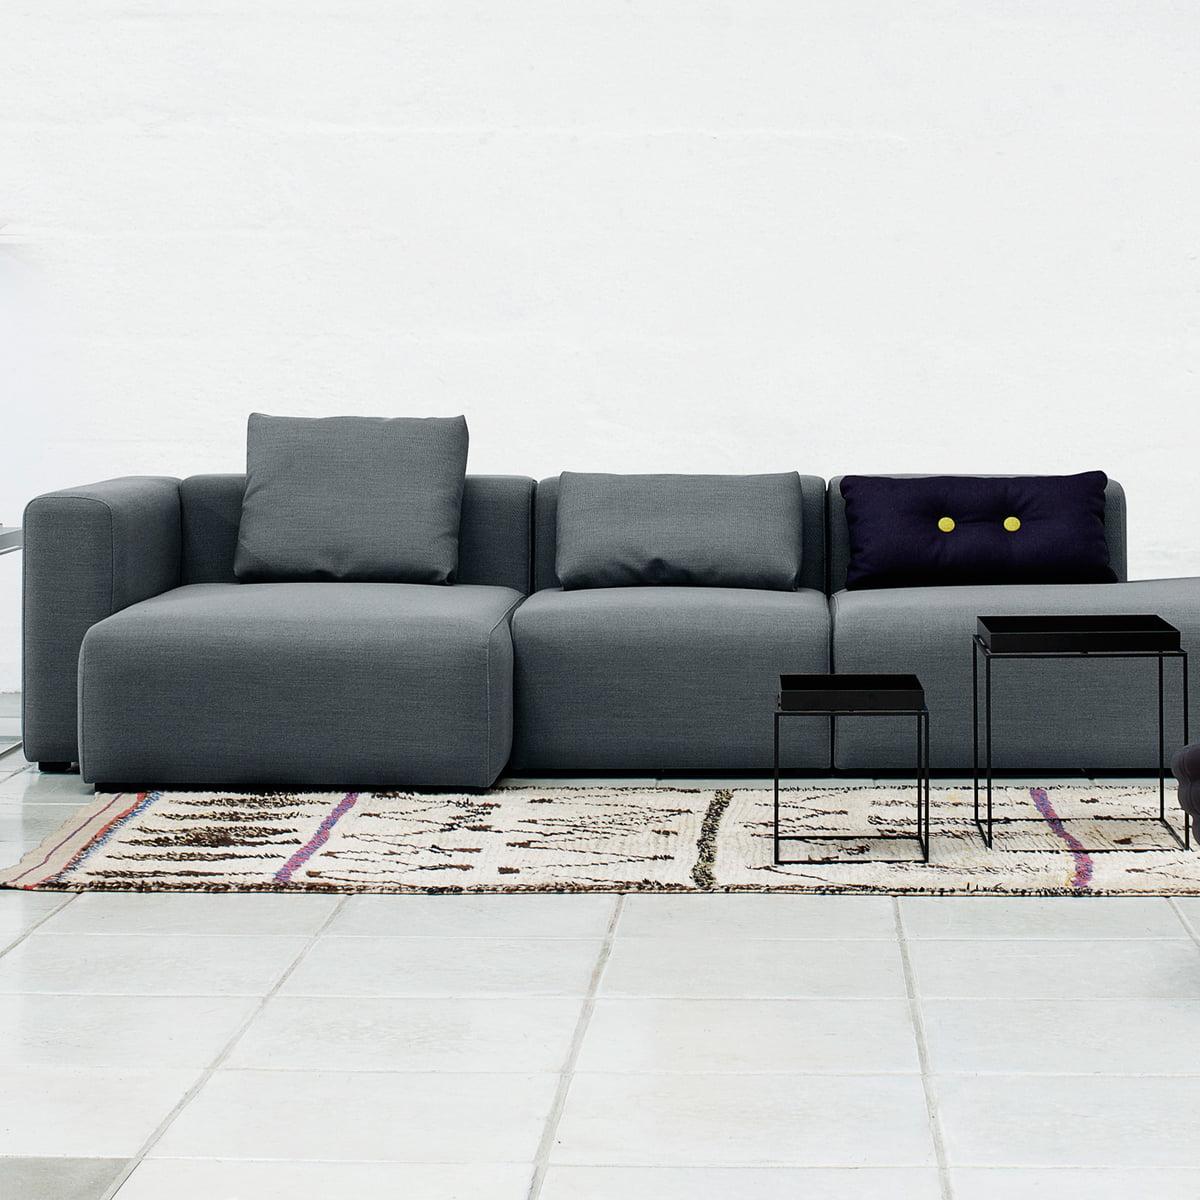 mags sofa 2 5 sitzer hay. Black Bedroom Furniture Sets. Home Design Ideas